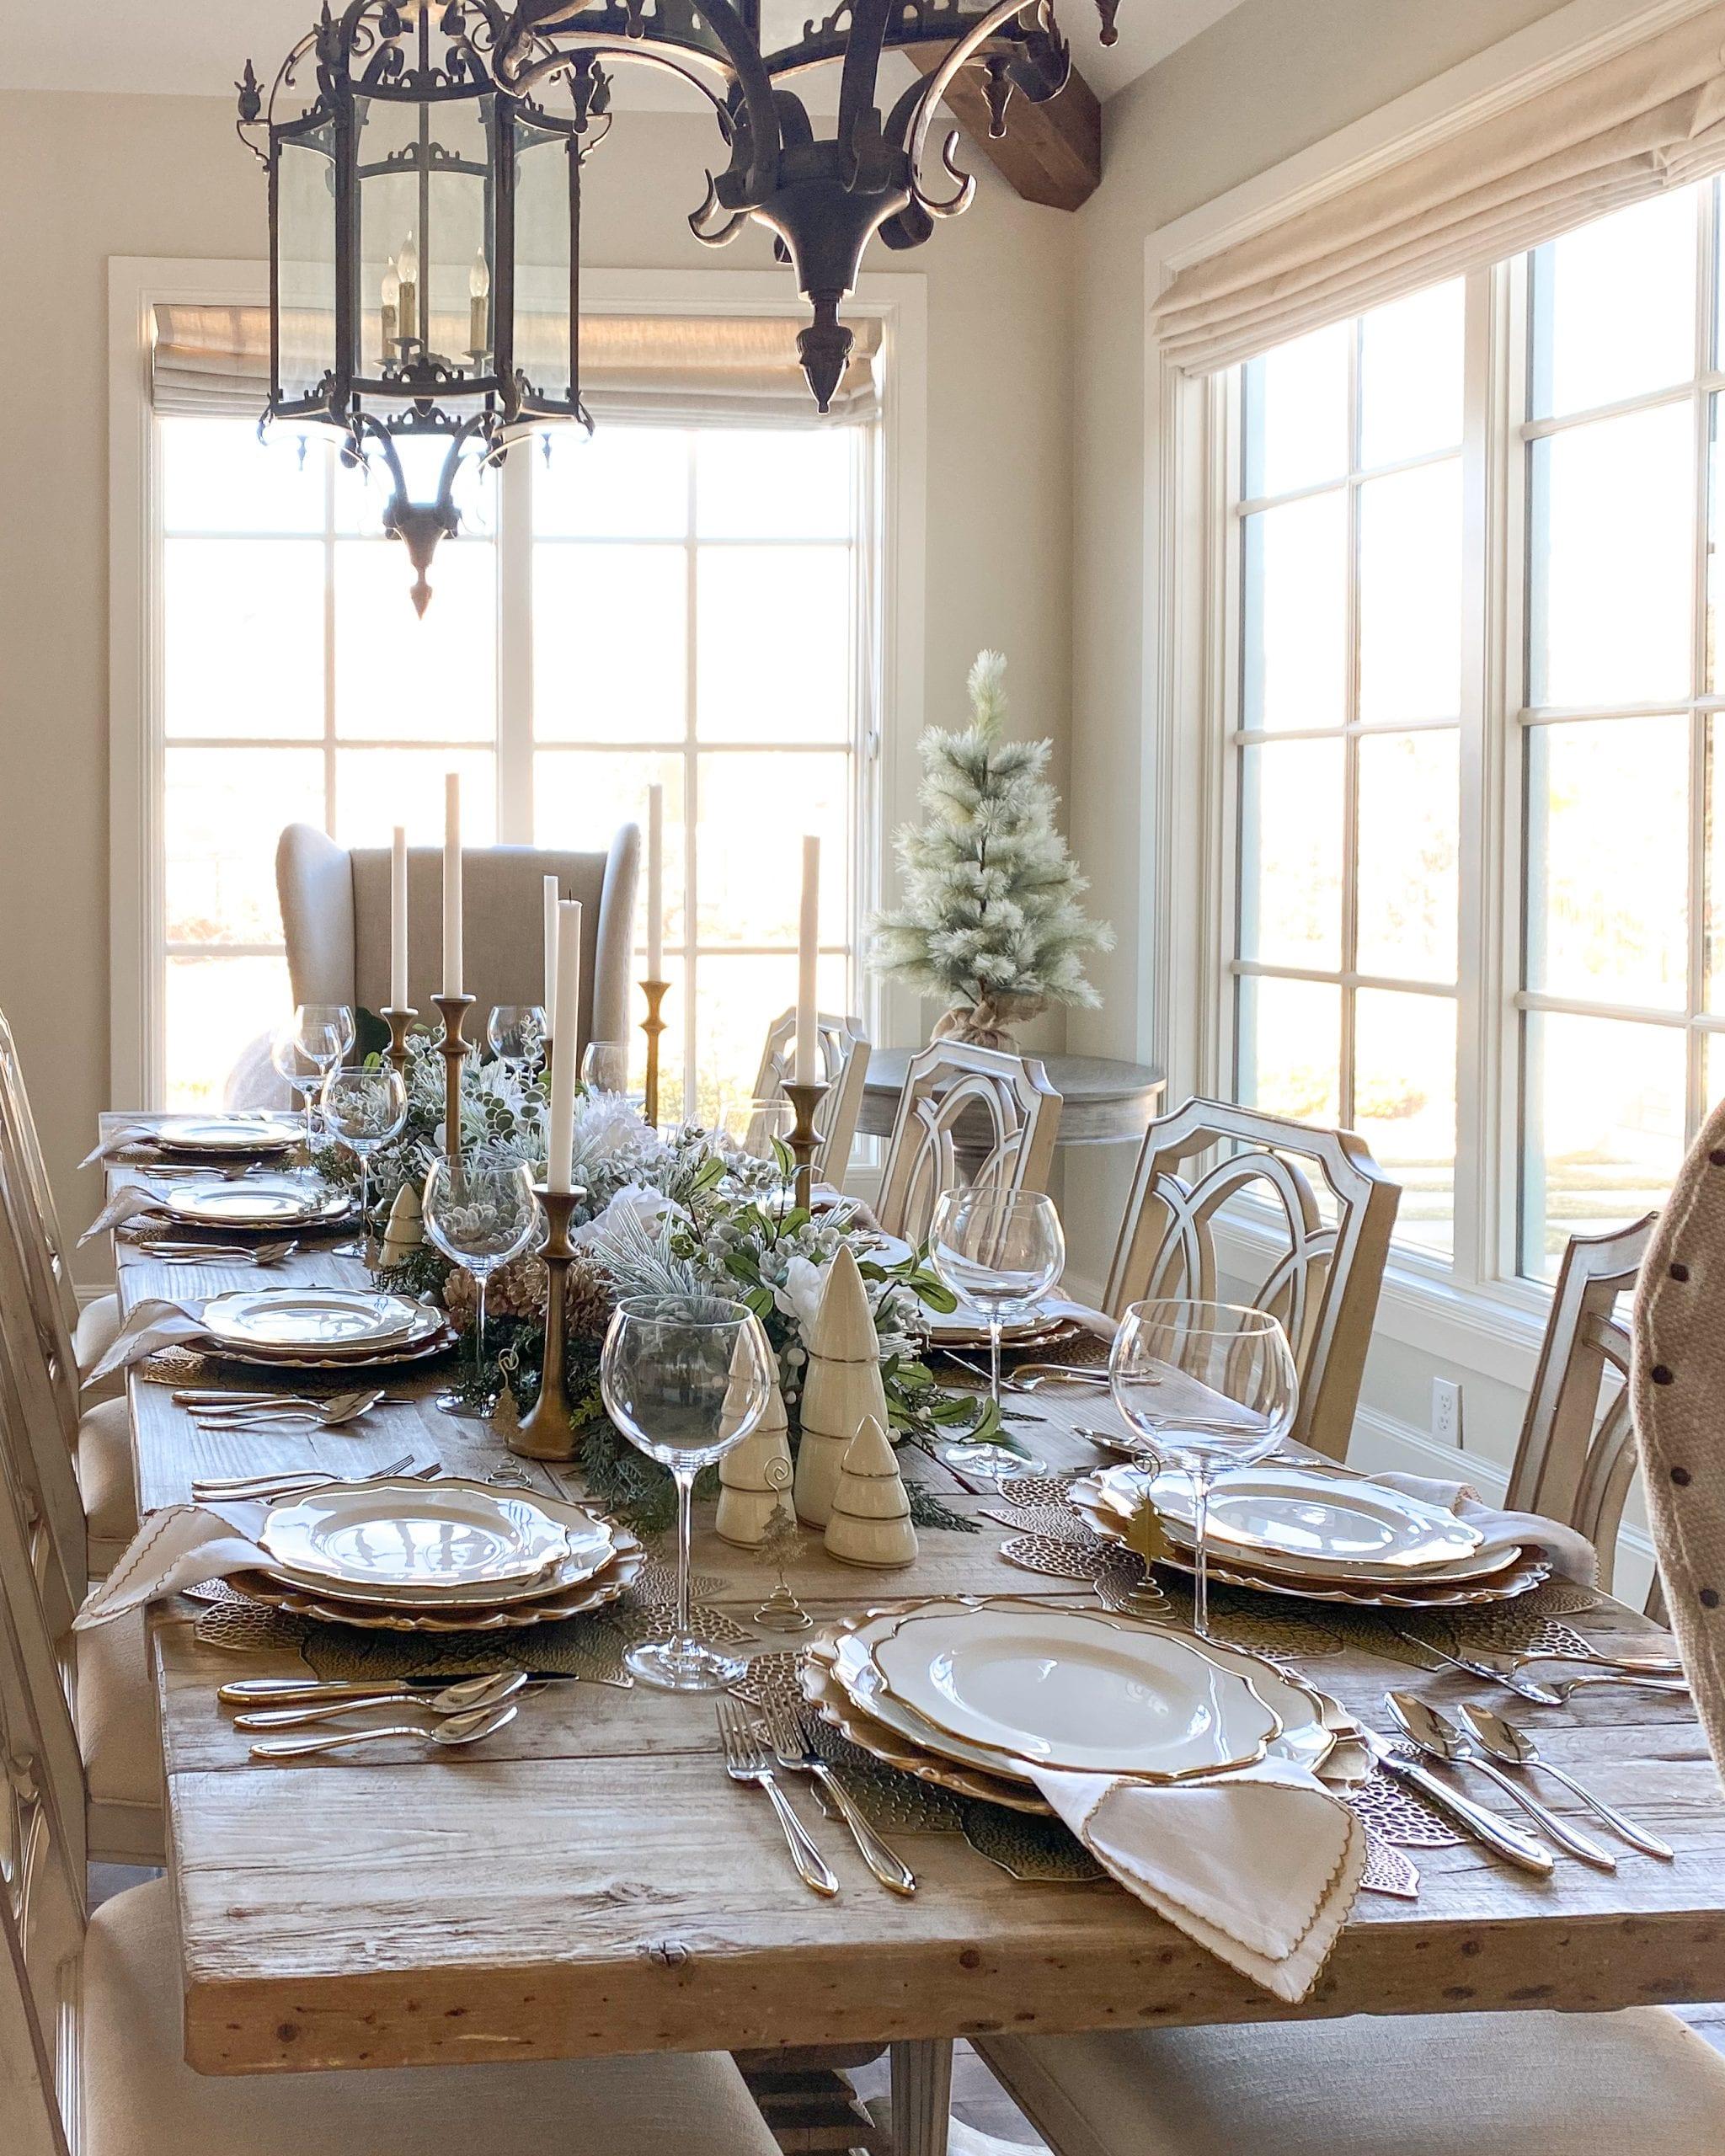 Lenox dinnerware table setting